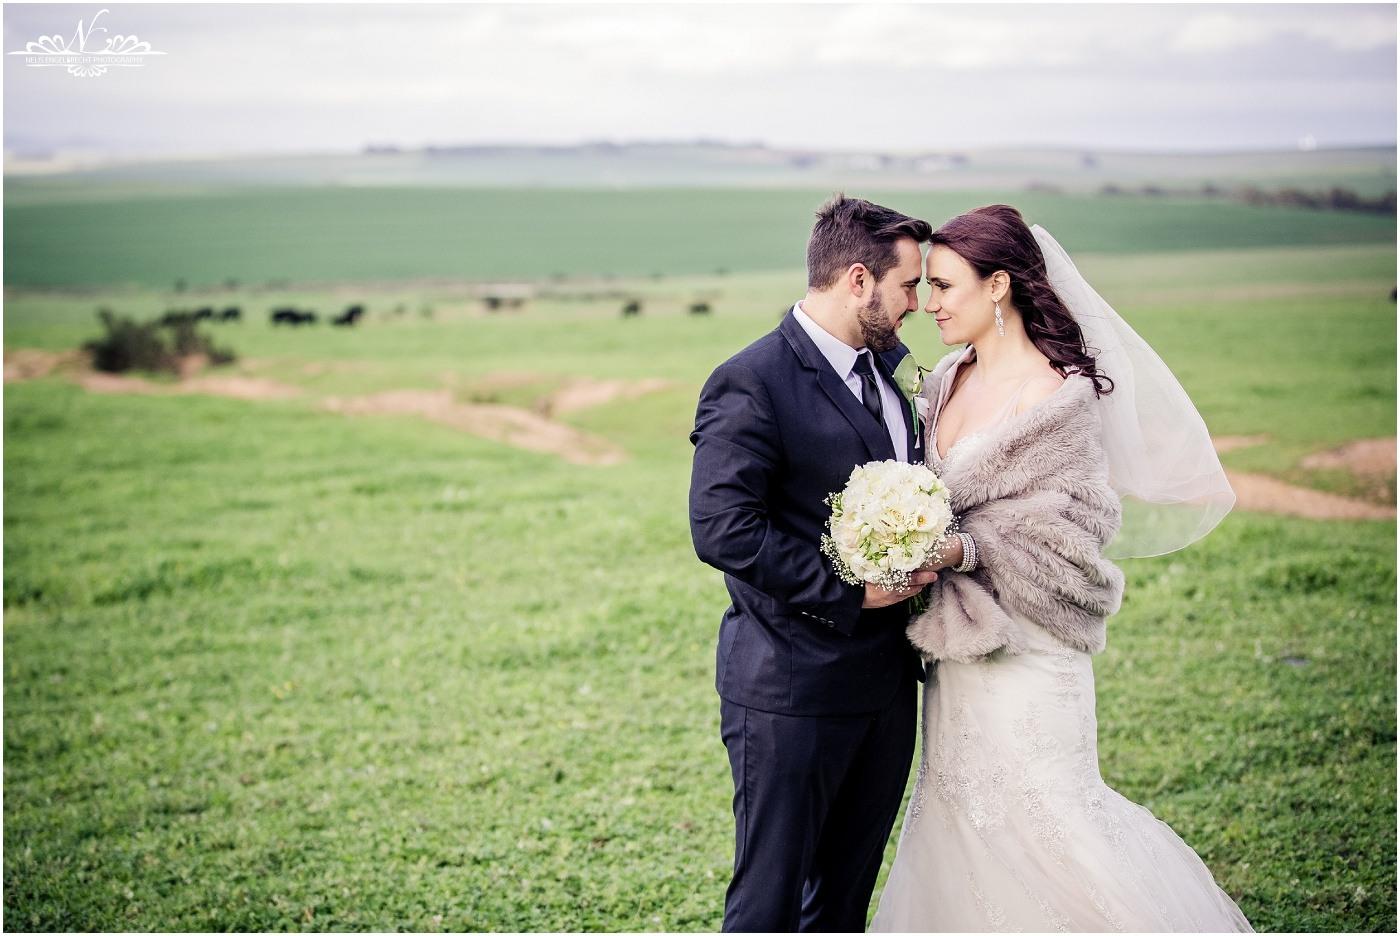 Eensgezind-Wedding-Photos-Nelis-Engelbrecht-Photography-087